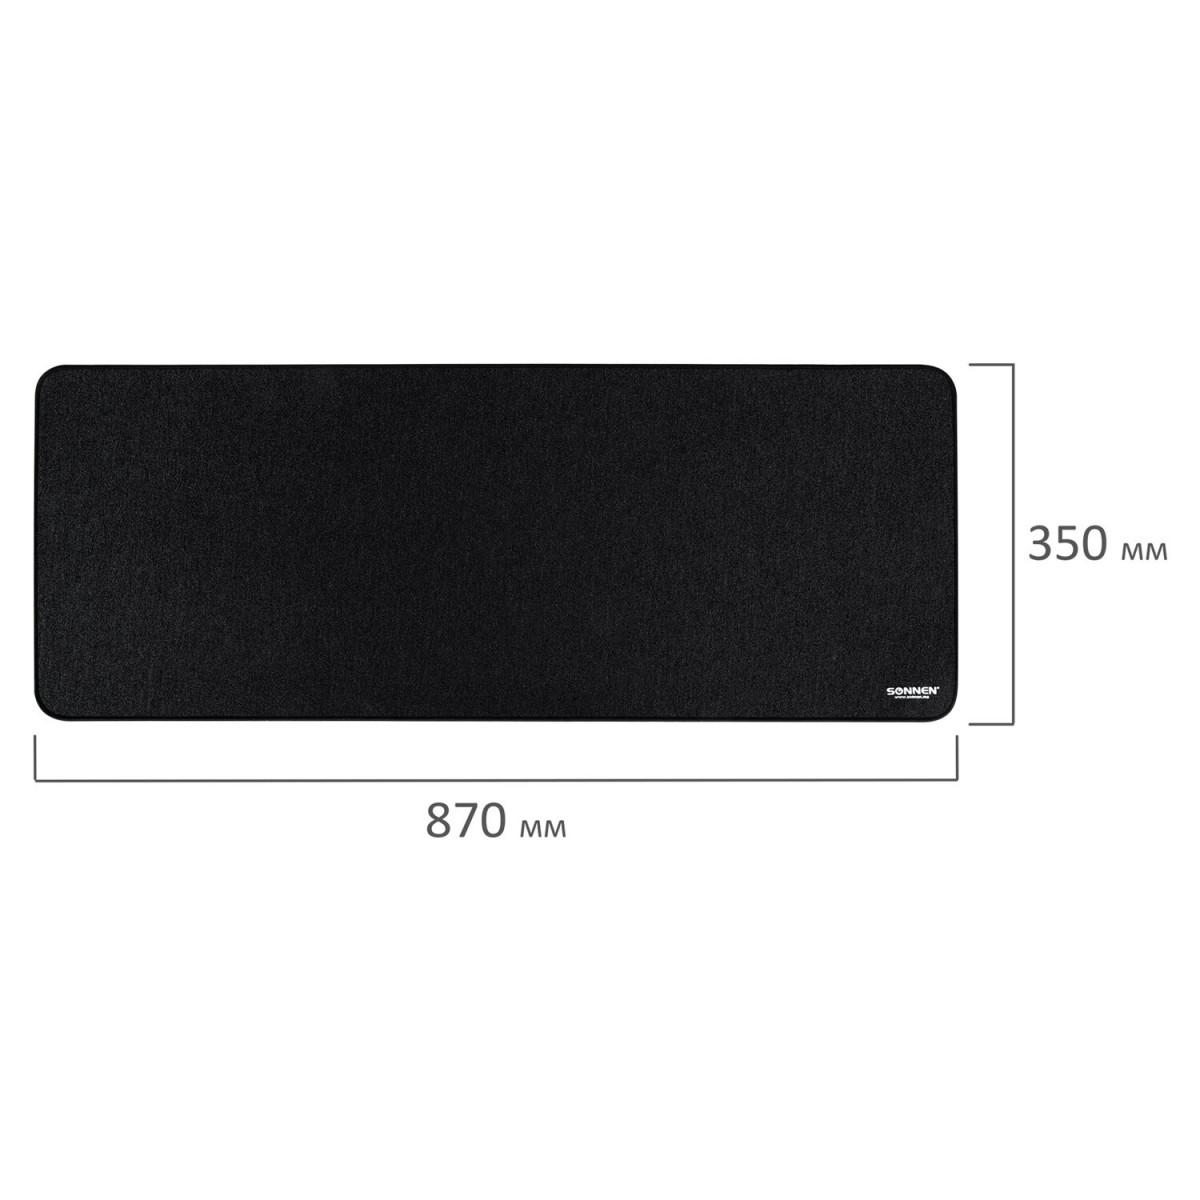 "Коврик для мыши игровой SONNEN ""WIDE RANGE"", резина + ткань, 870х350х4 мм, чёрный, 513315 (арт. 513315)"